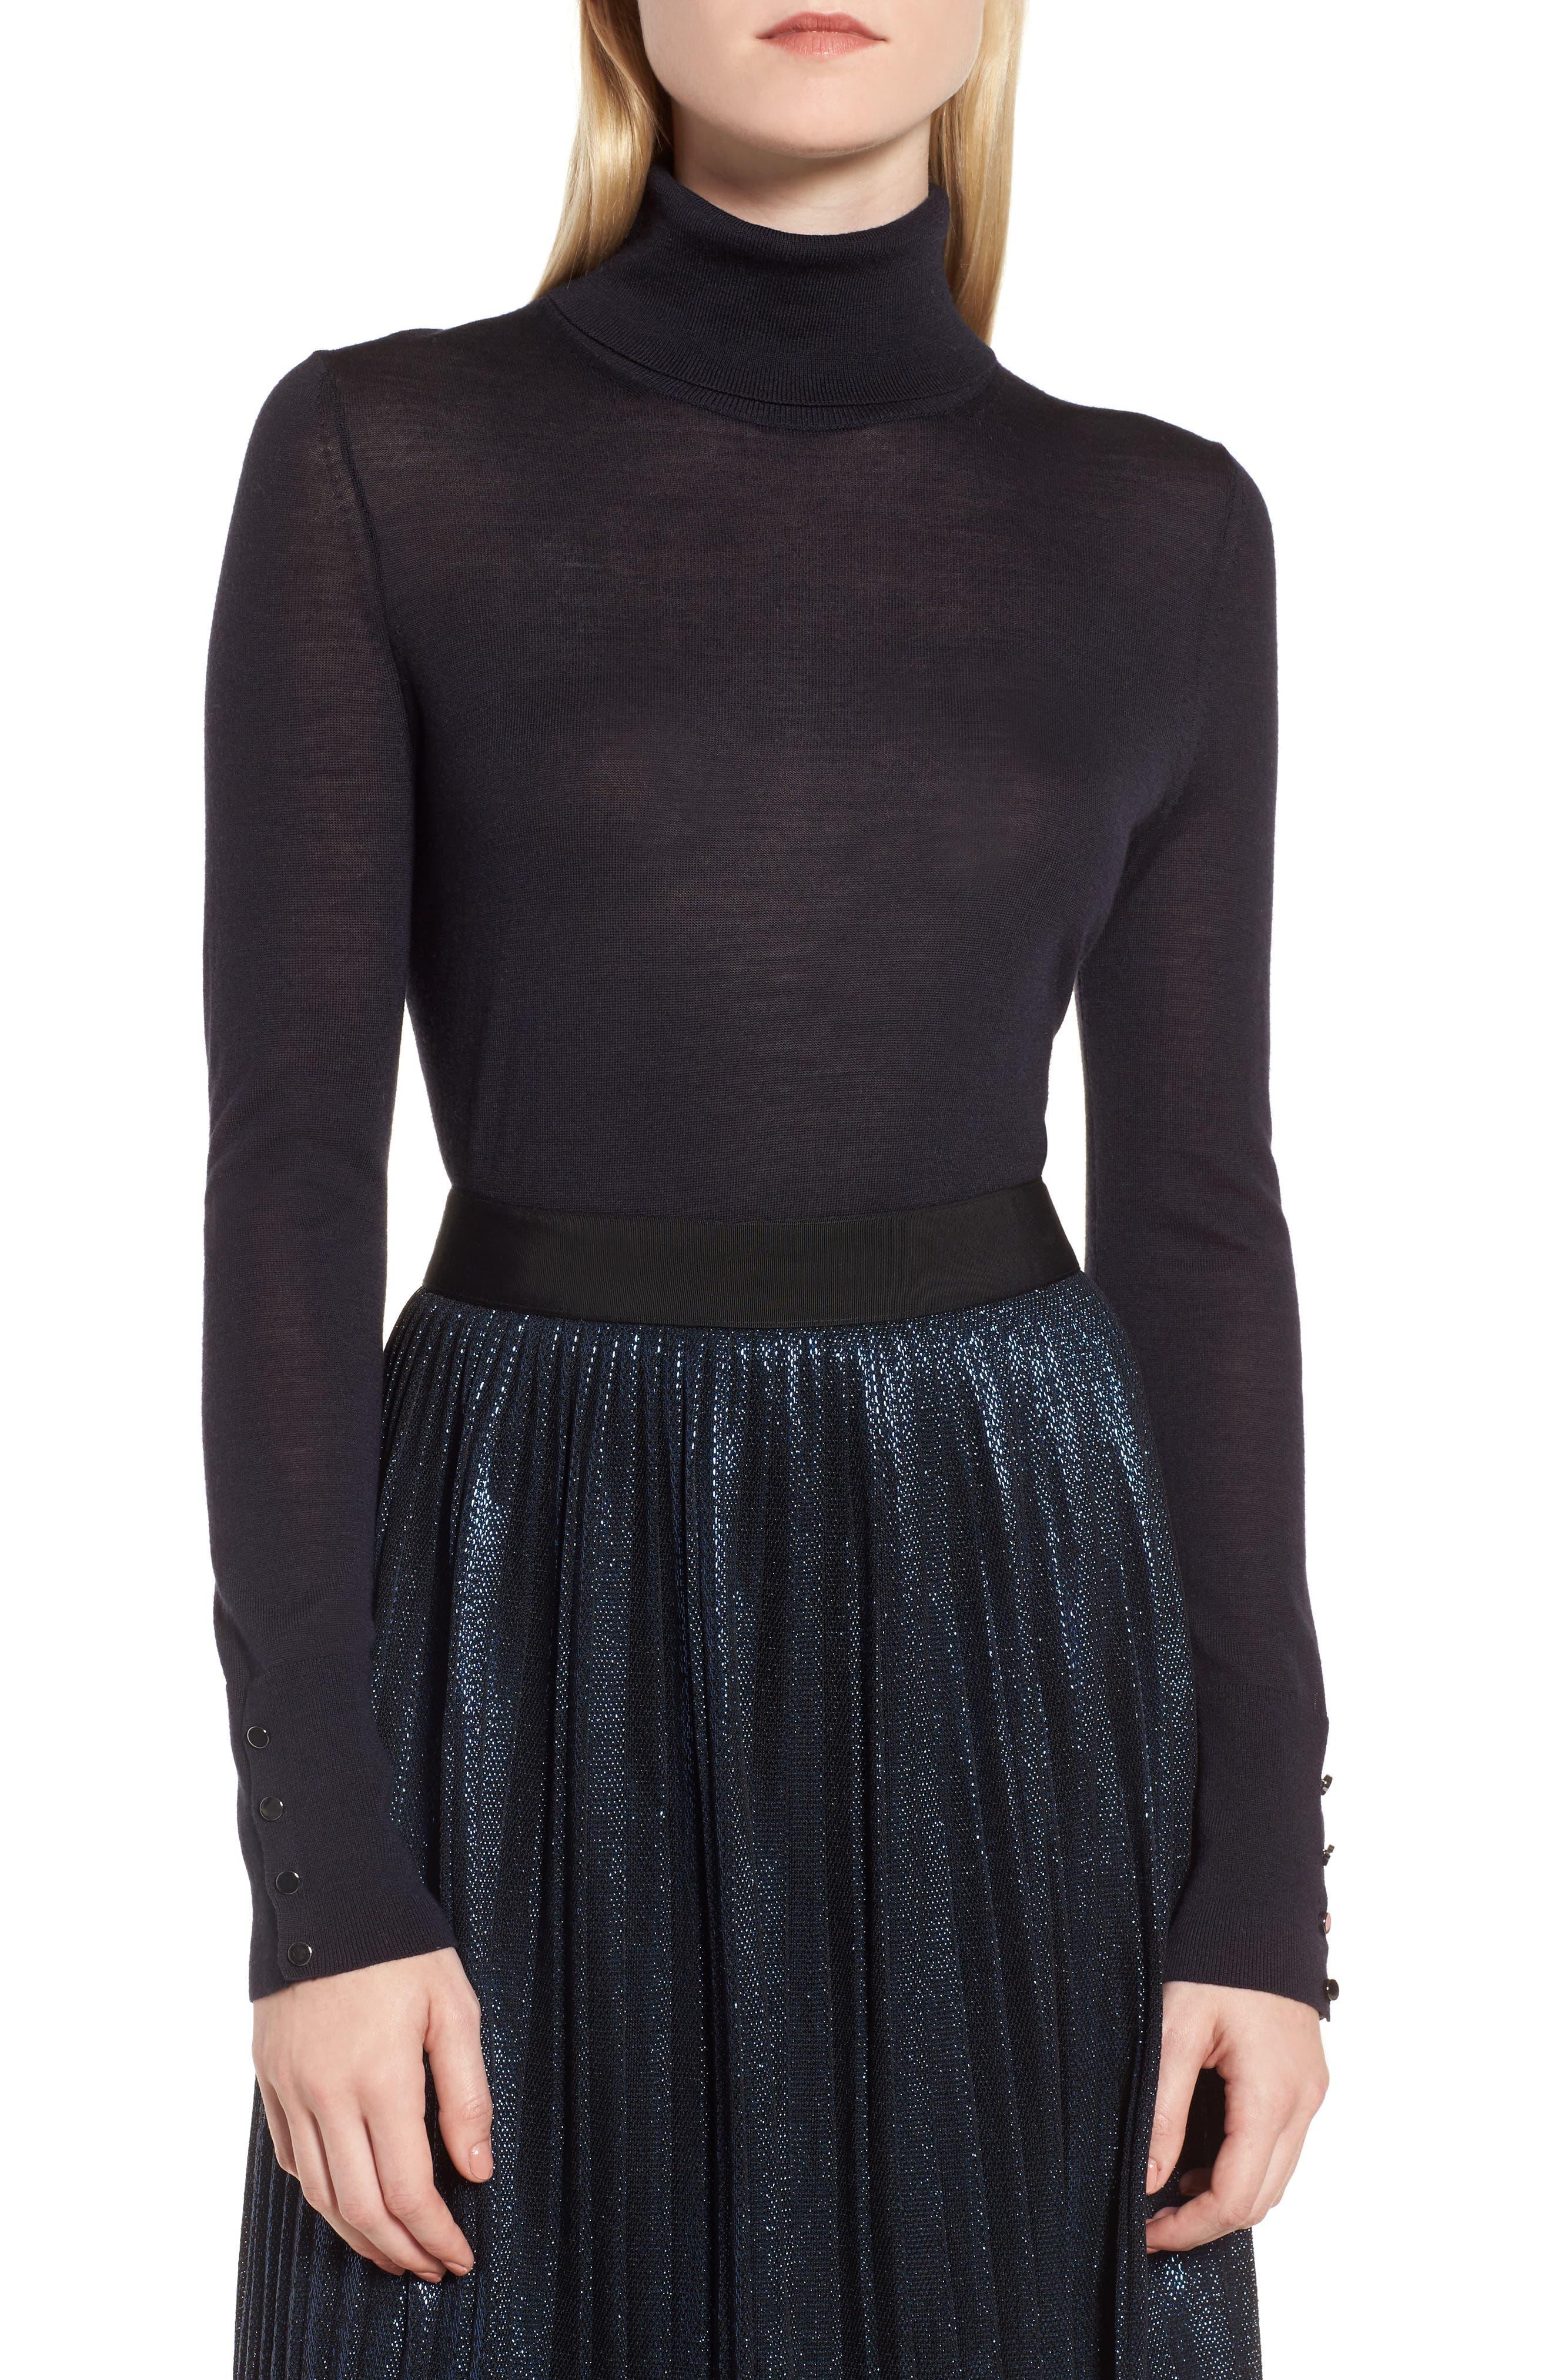 Farrella Wool Turtleneck Sweater,                             Main thumbnail 1, color,                             480